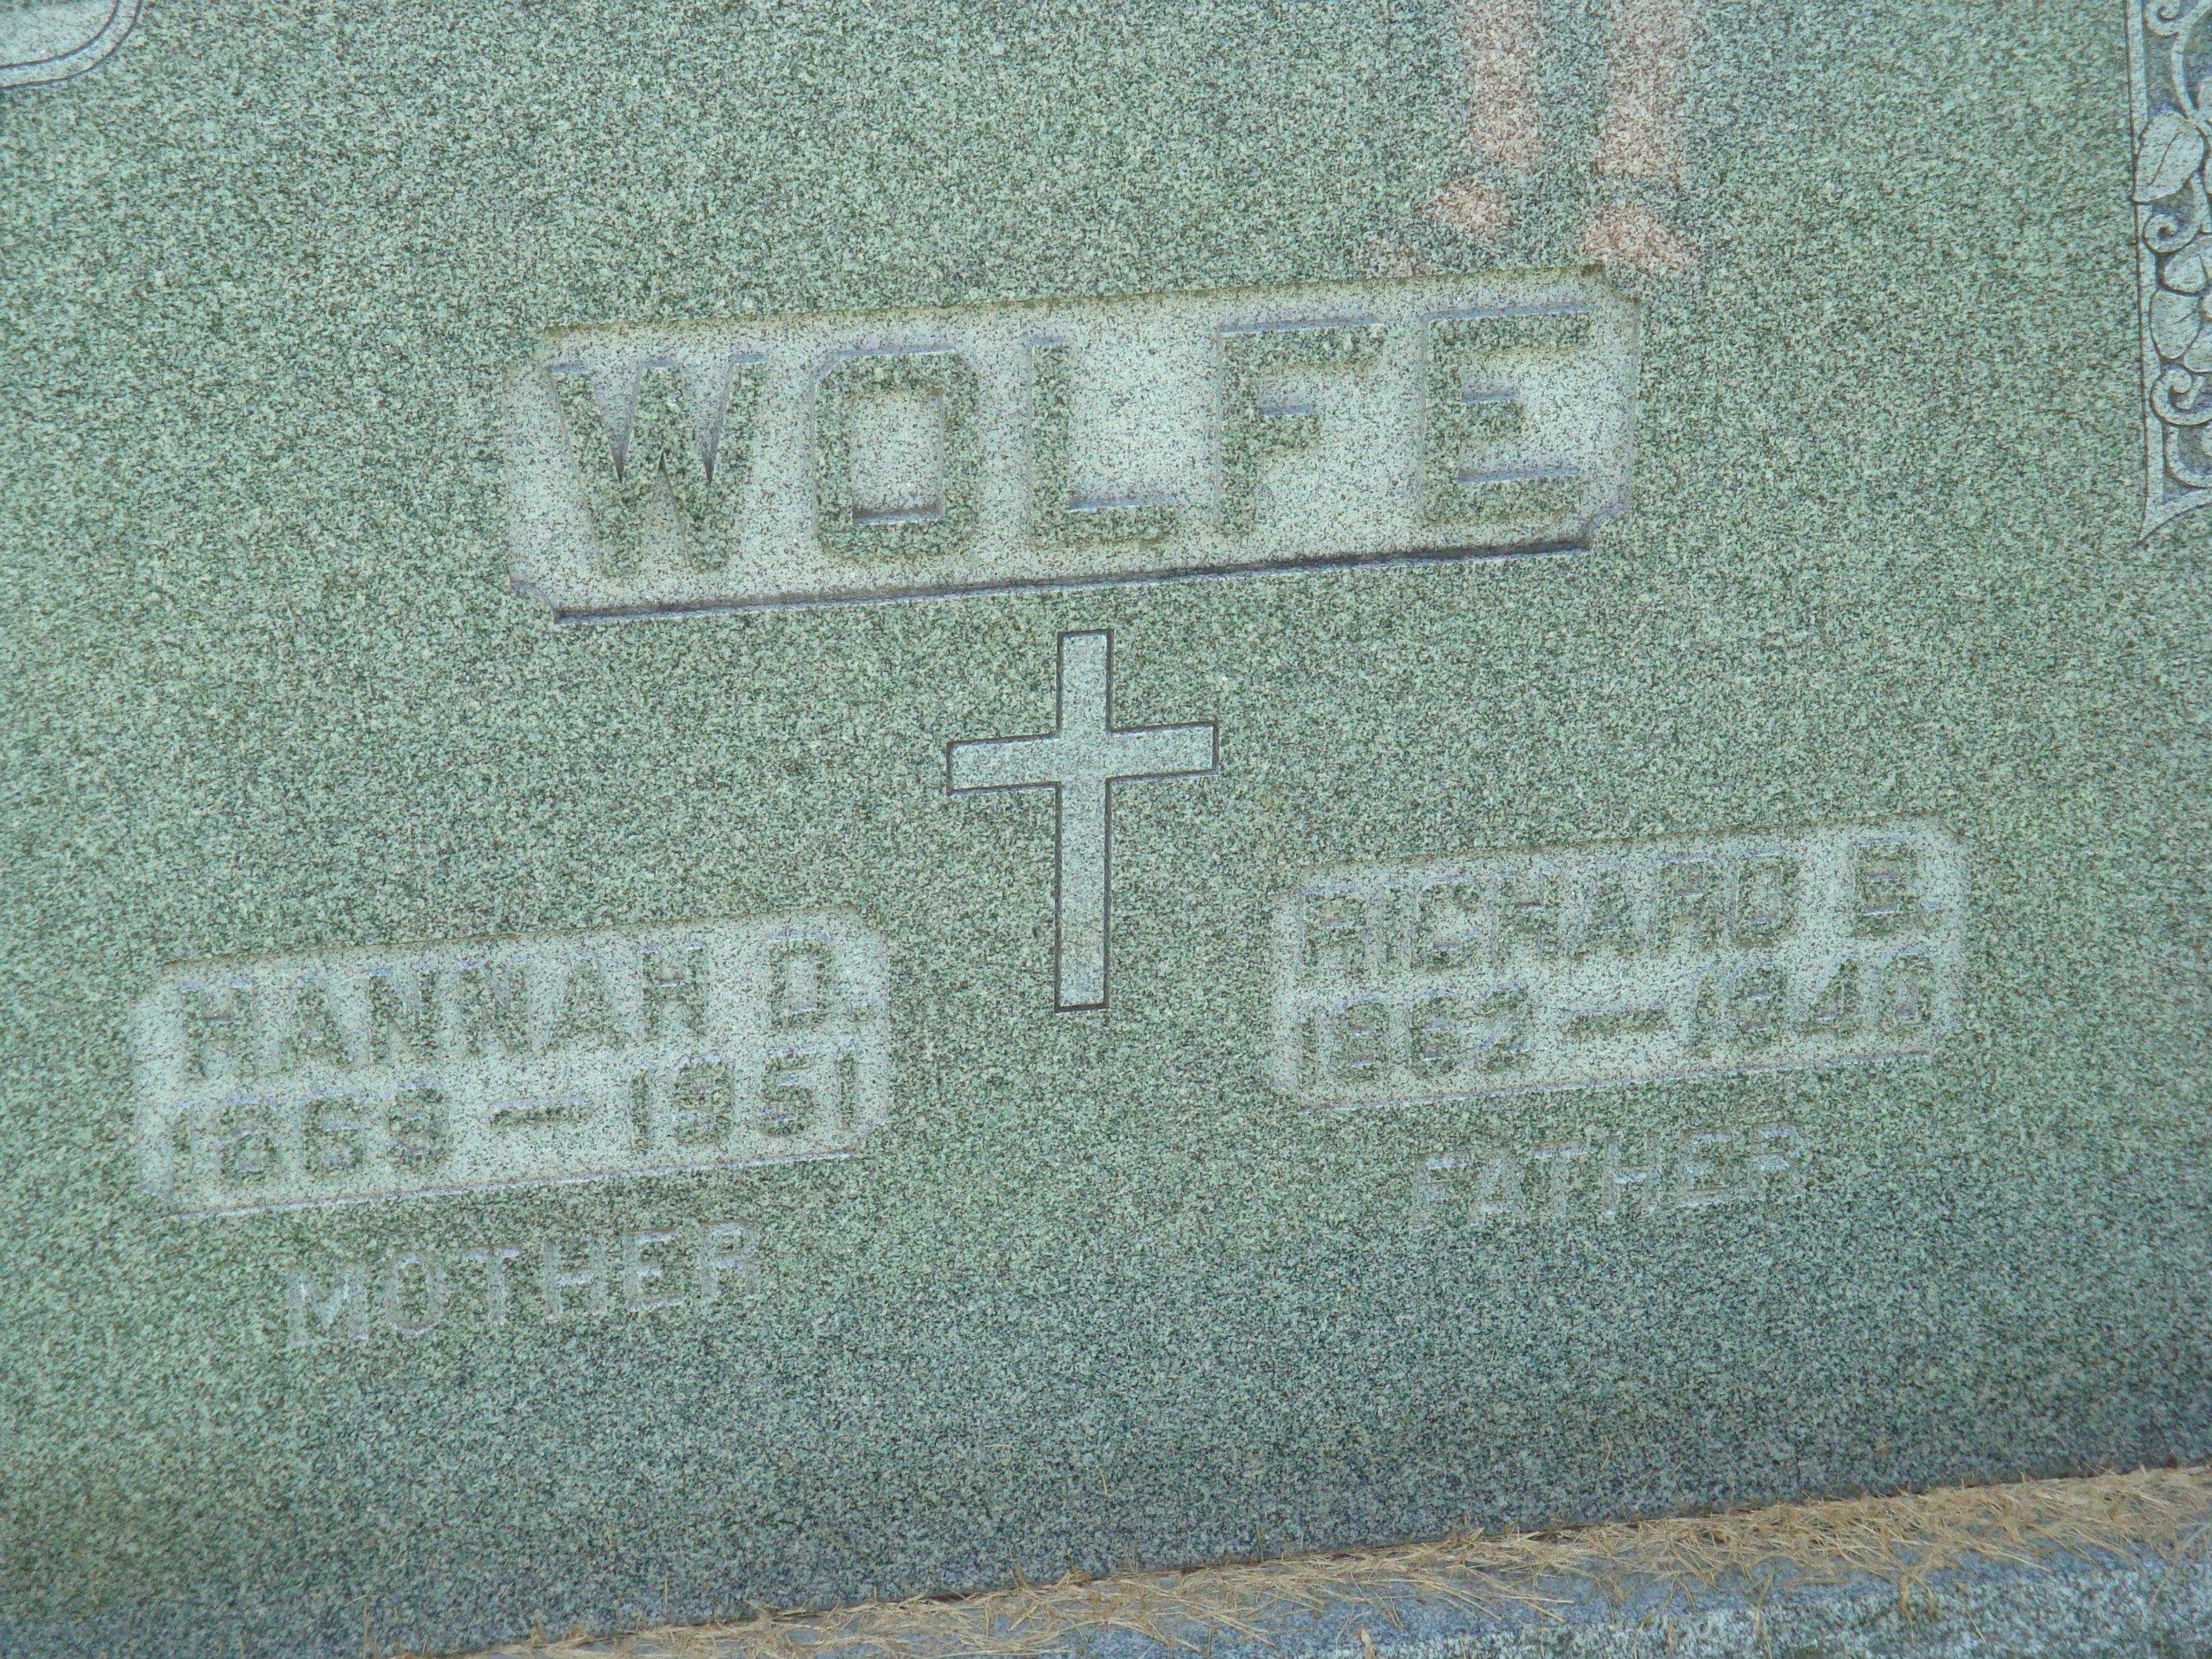 Wolfe gravestone, Saint Joseph's Cemetery, DeWitt (user aeiou02 / Ancestry.com)